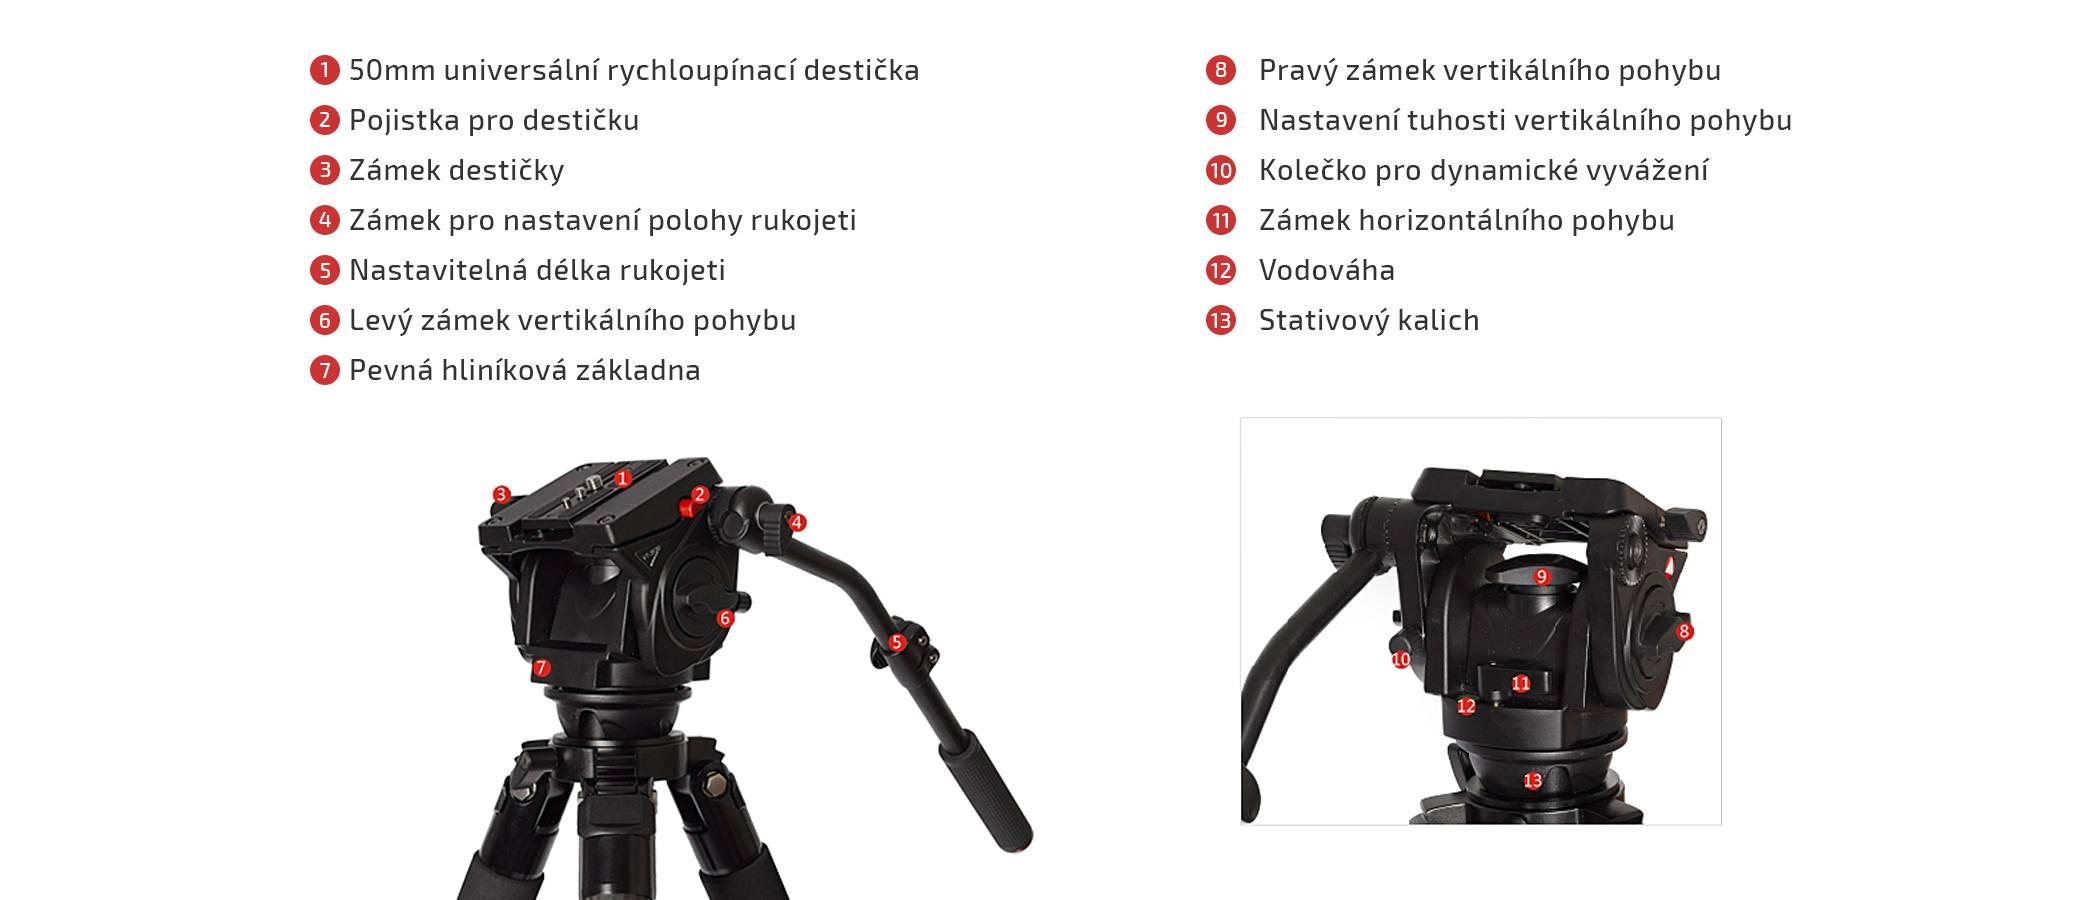 film-technika-kingjoy-vt-3500-vt-3530-krátký-hlava-2